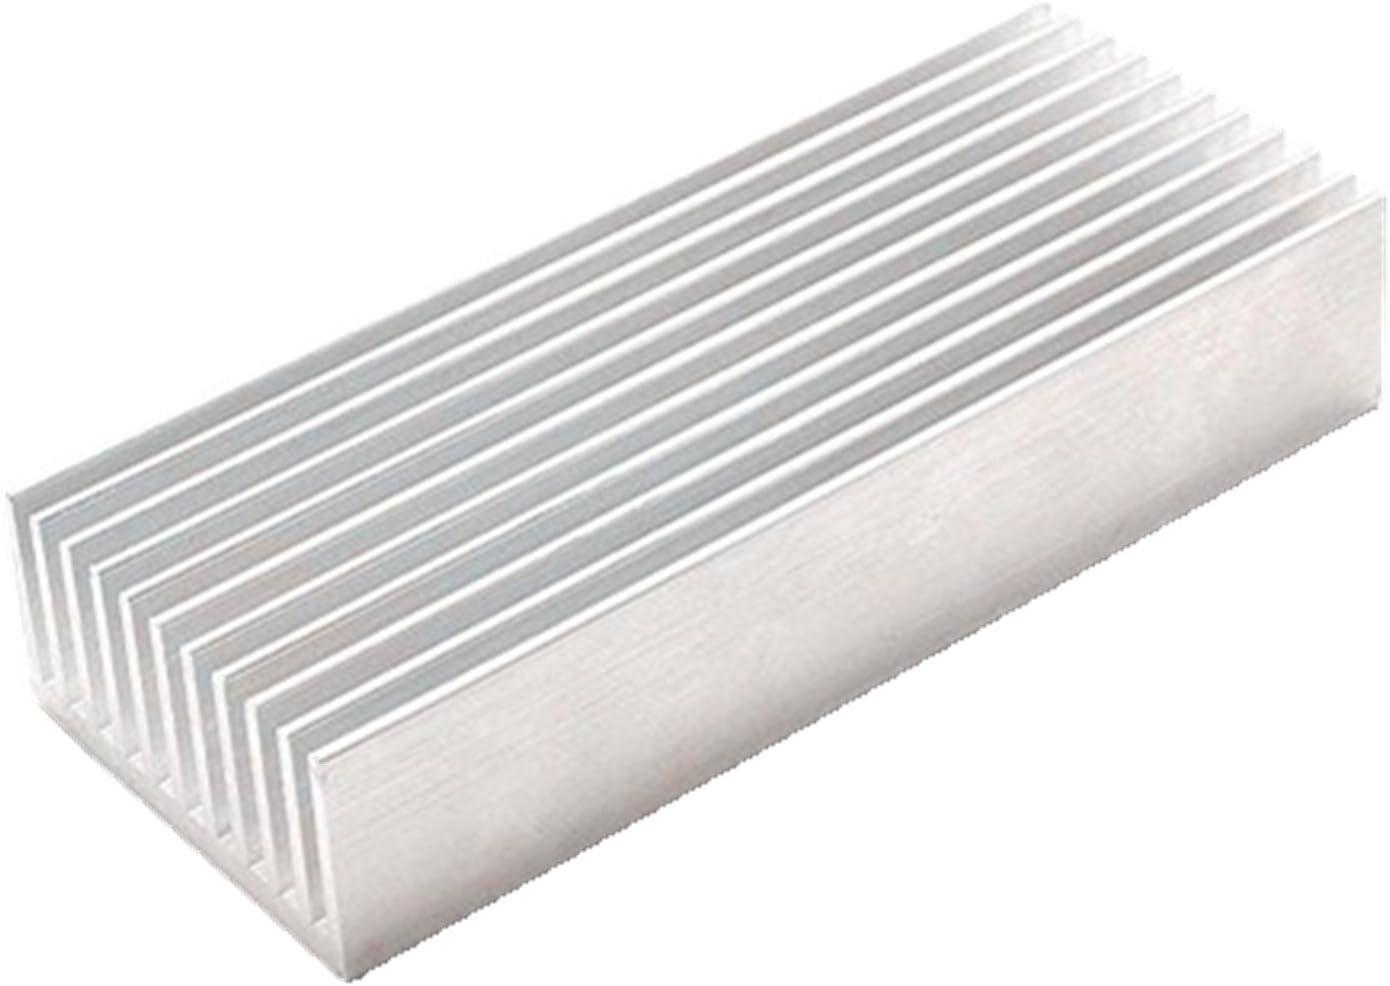 OdiySurveil(TM) 100 x 40 x 20MM Aluminium Heatsink Radiator Diffusion Cooling Fin Comb Heat Sink Cooler